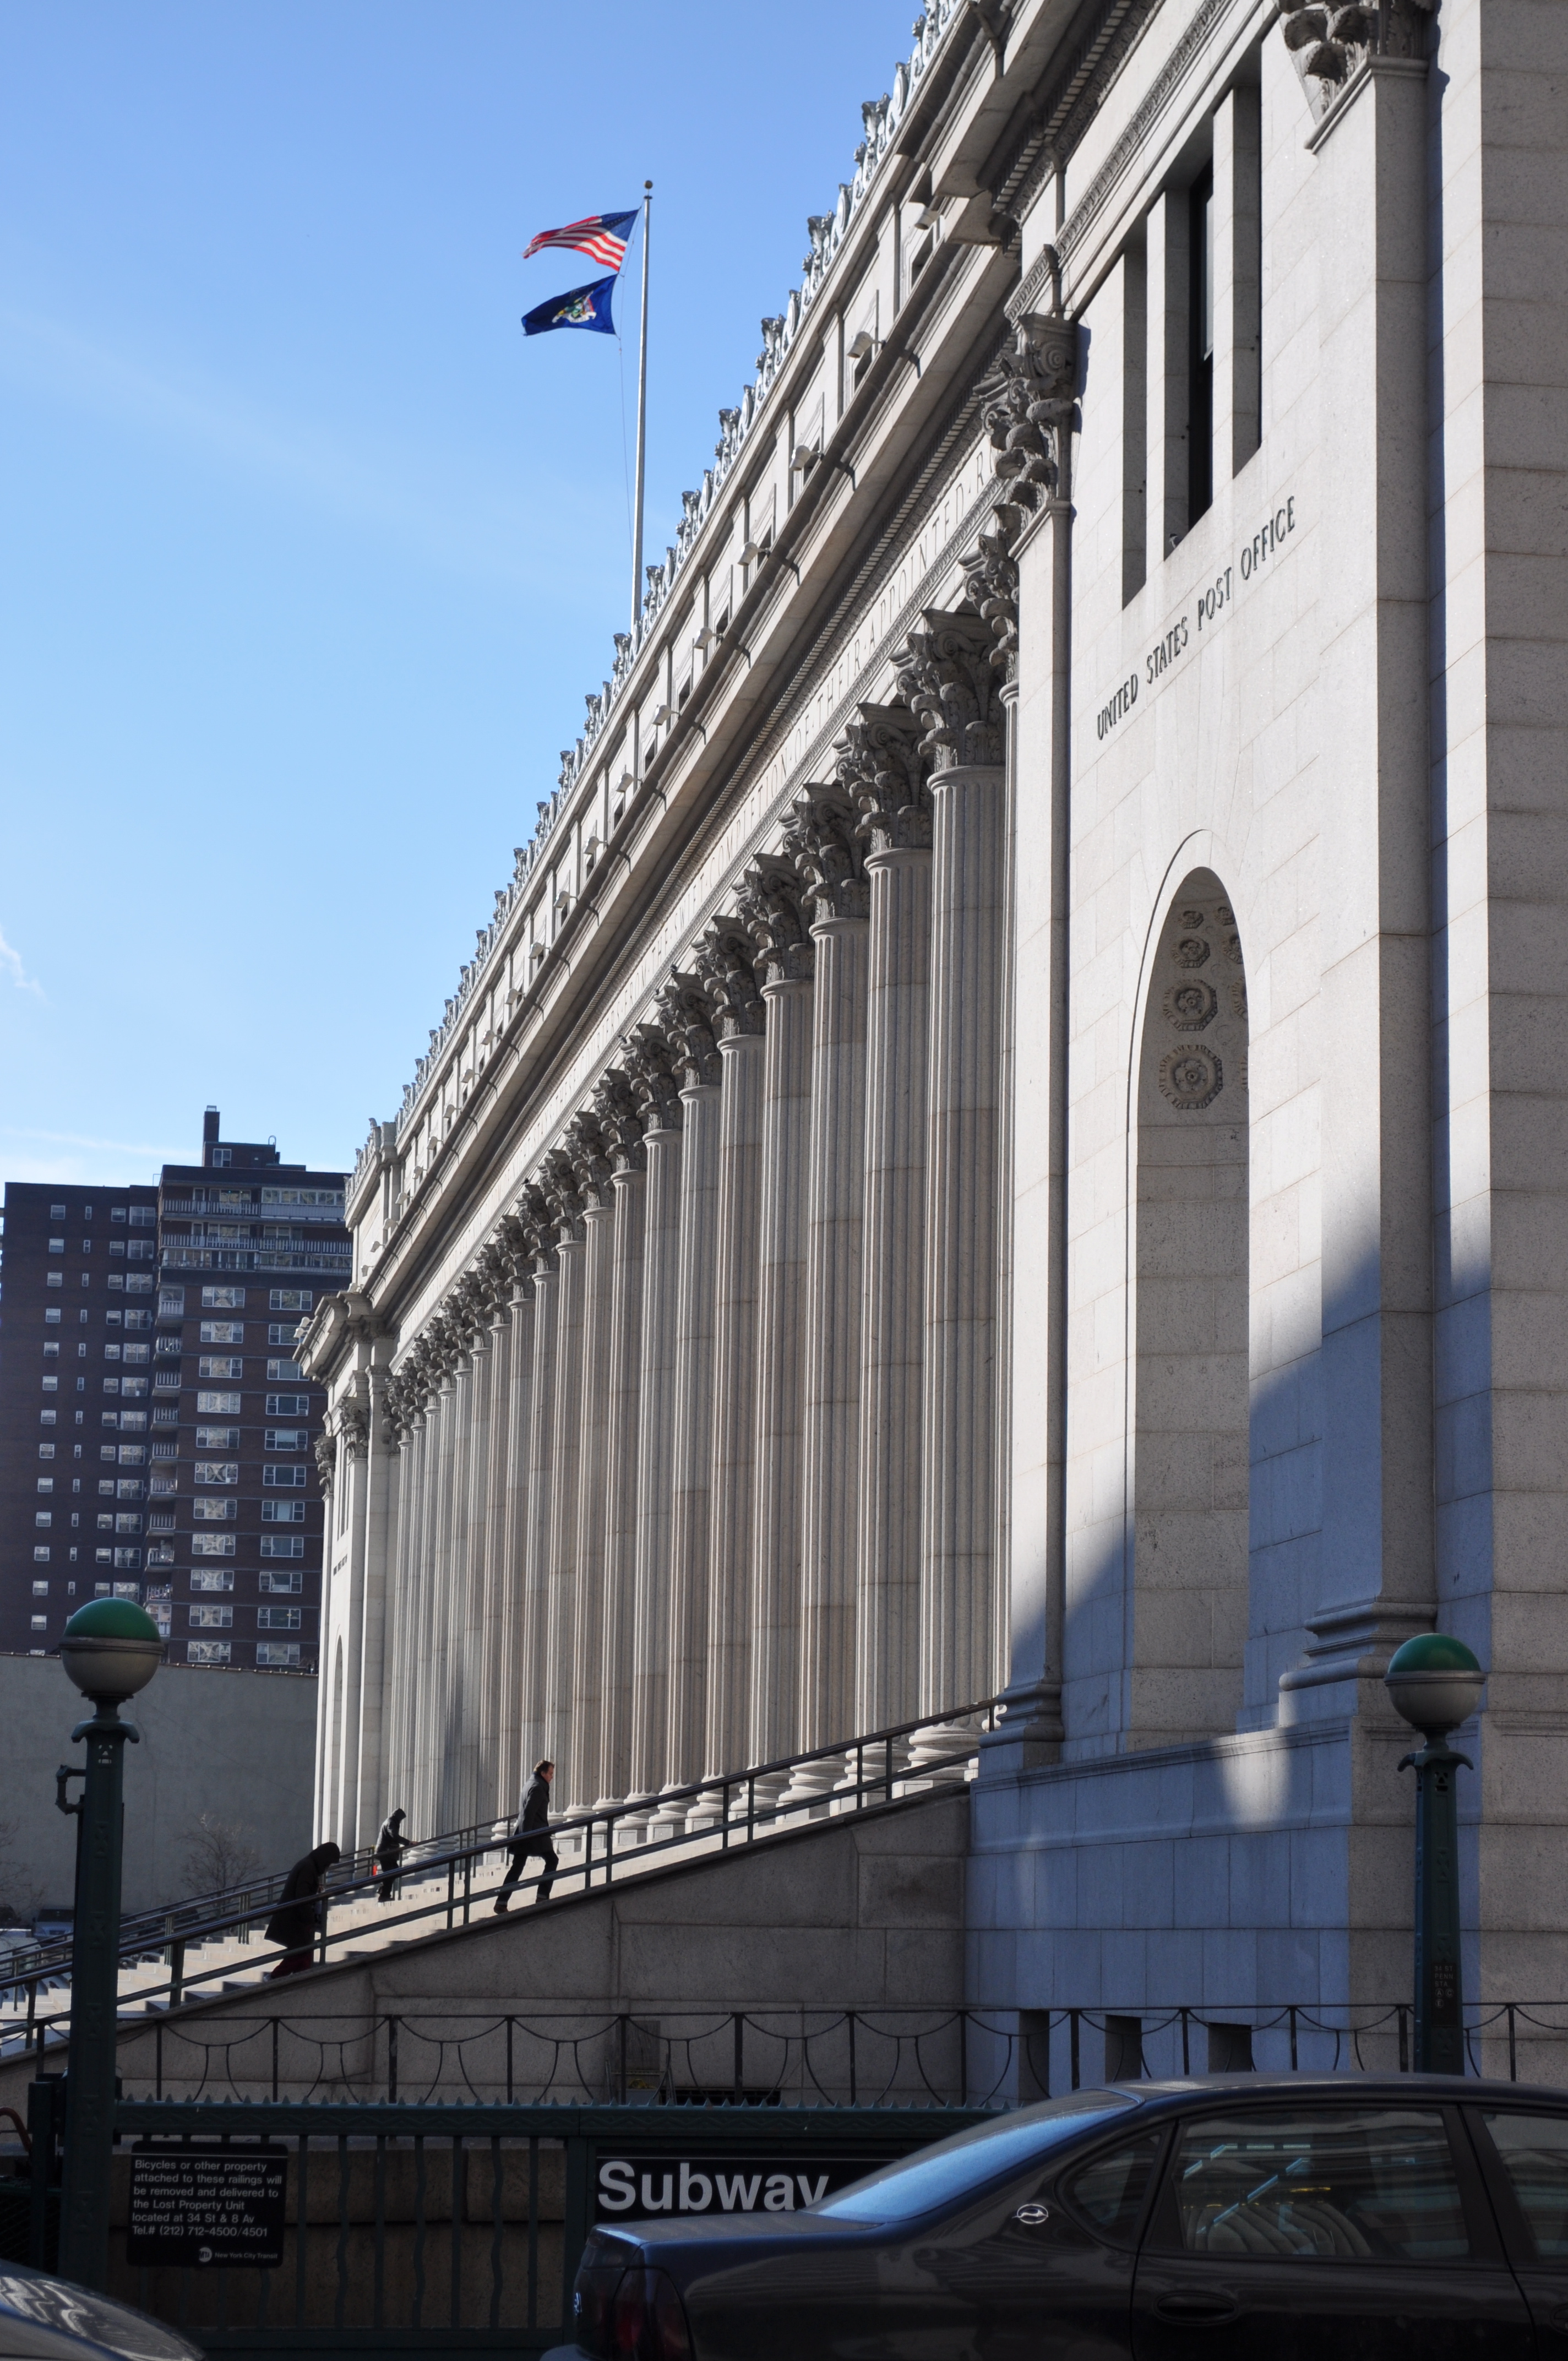 2011 Manhattan New York Trip: File:Entrance To James Farley Post Office, Manhattan (2011